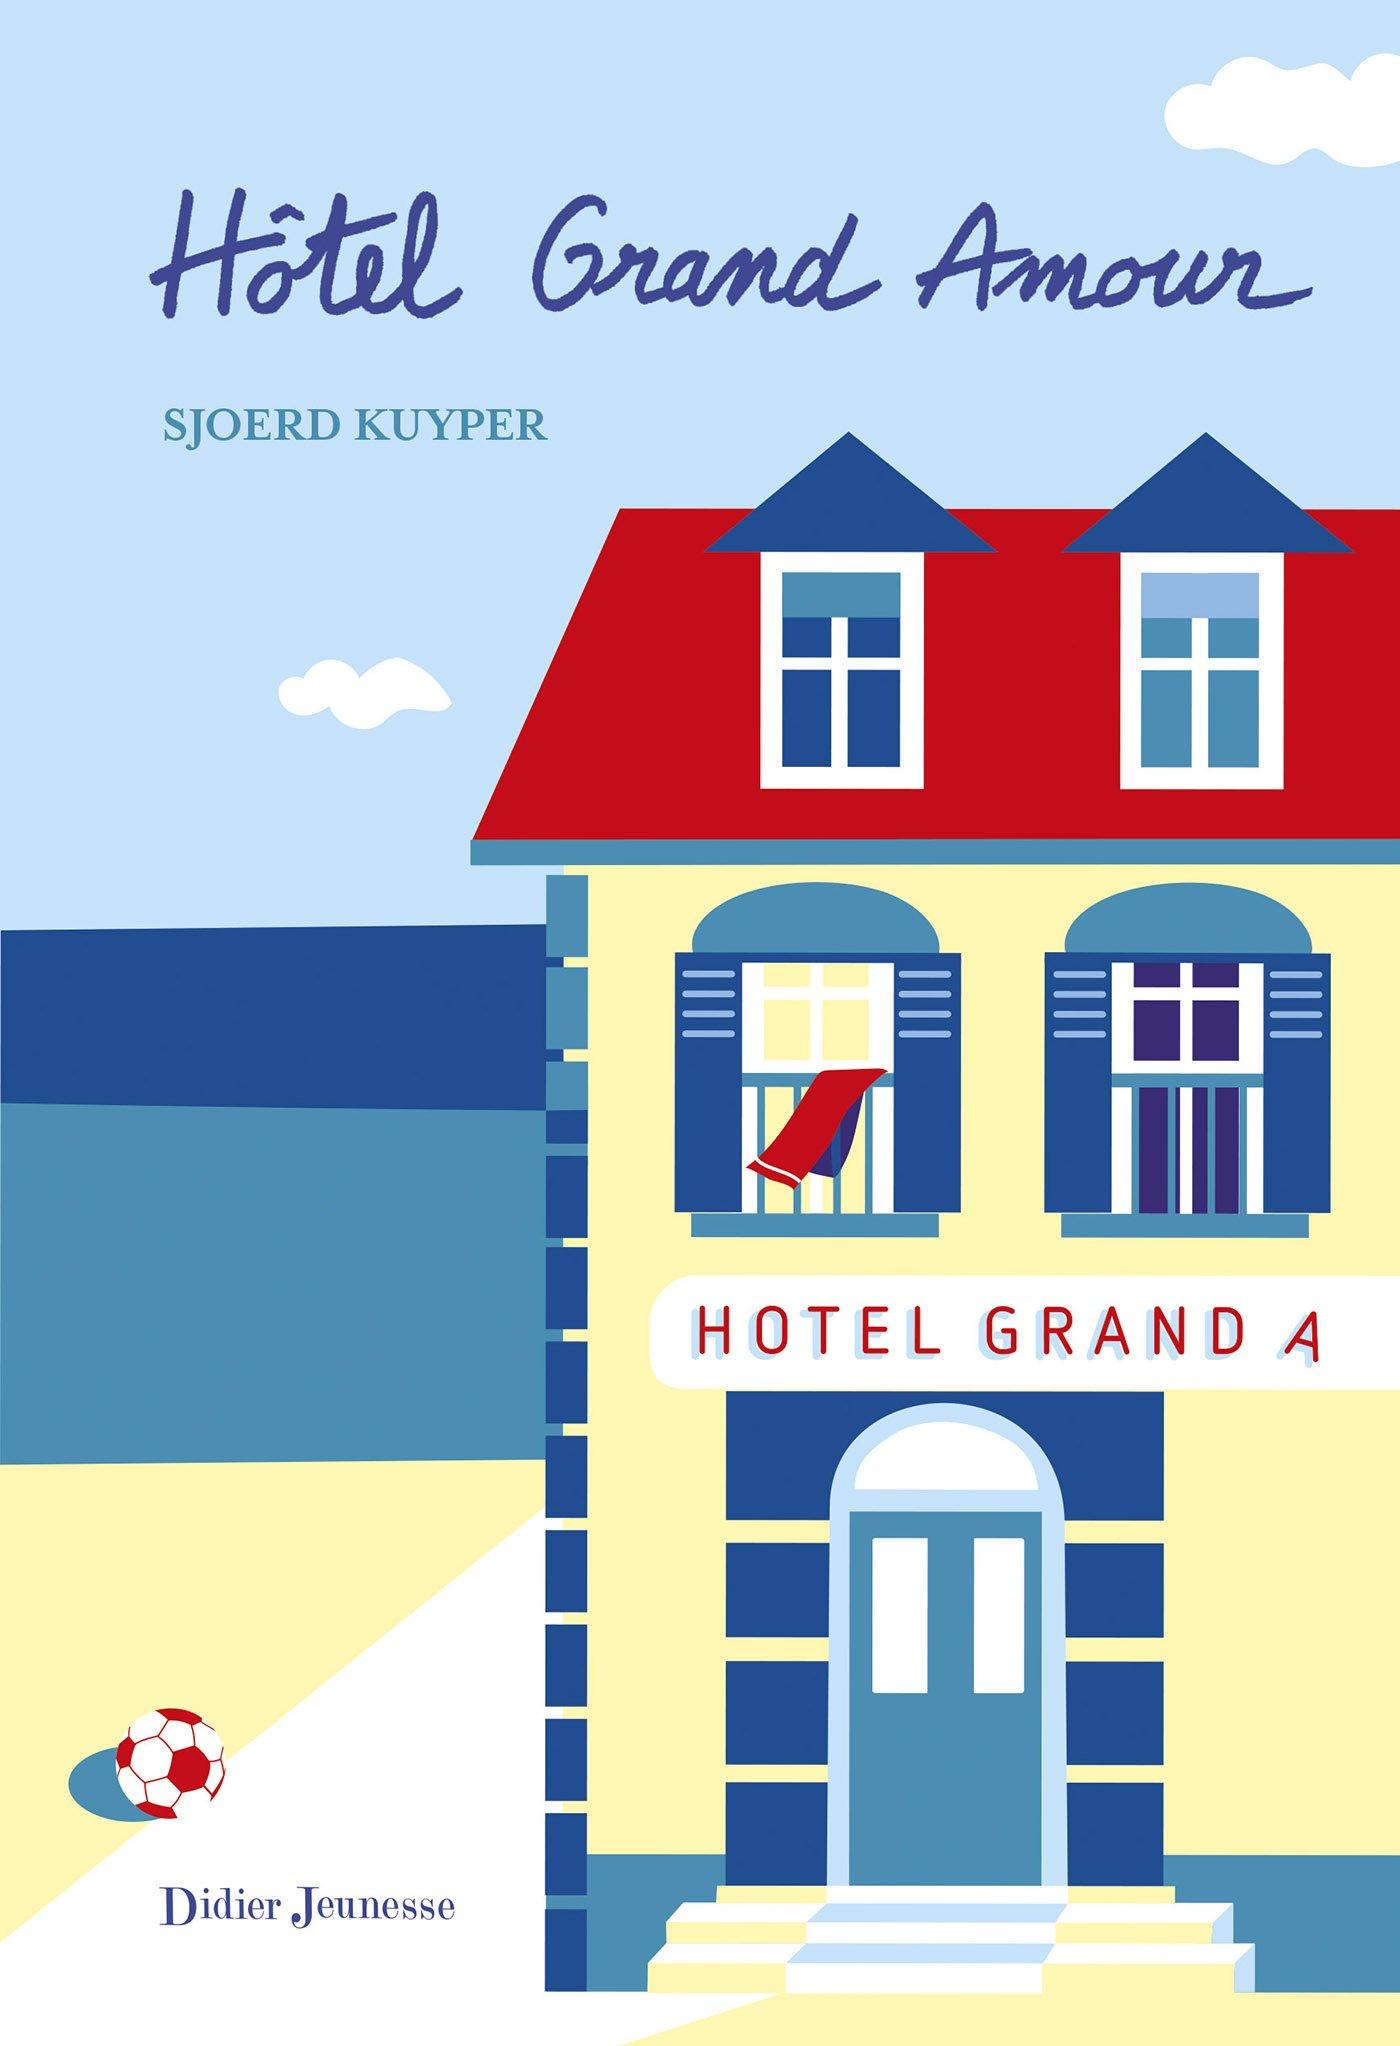 Hôtel Grand Amour de Sjoerd Kuyper